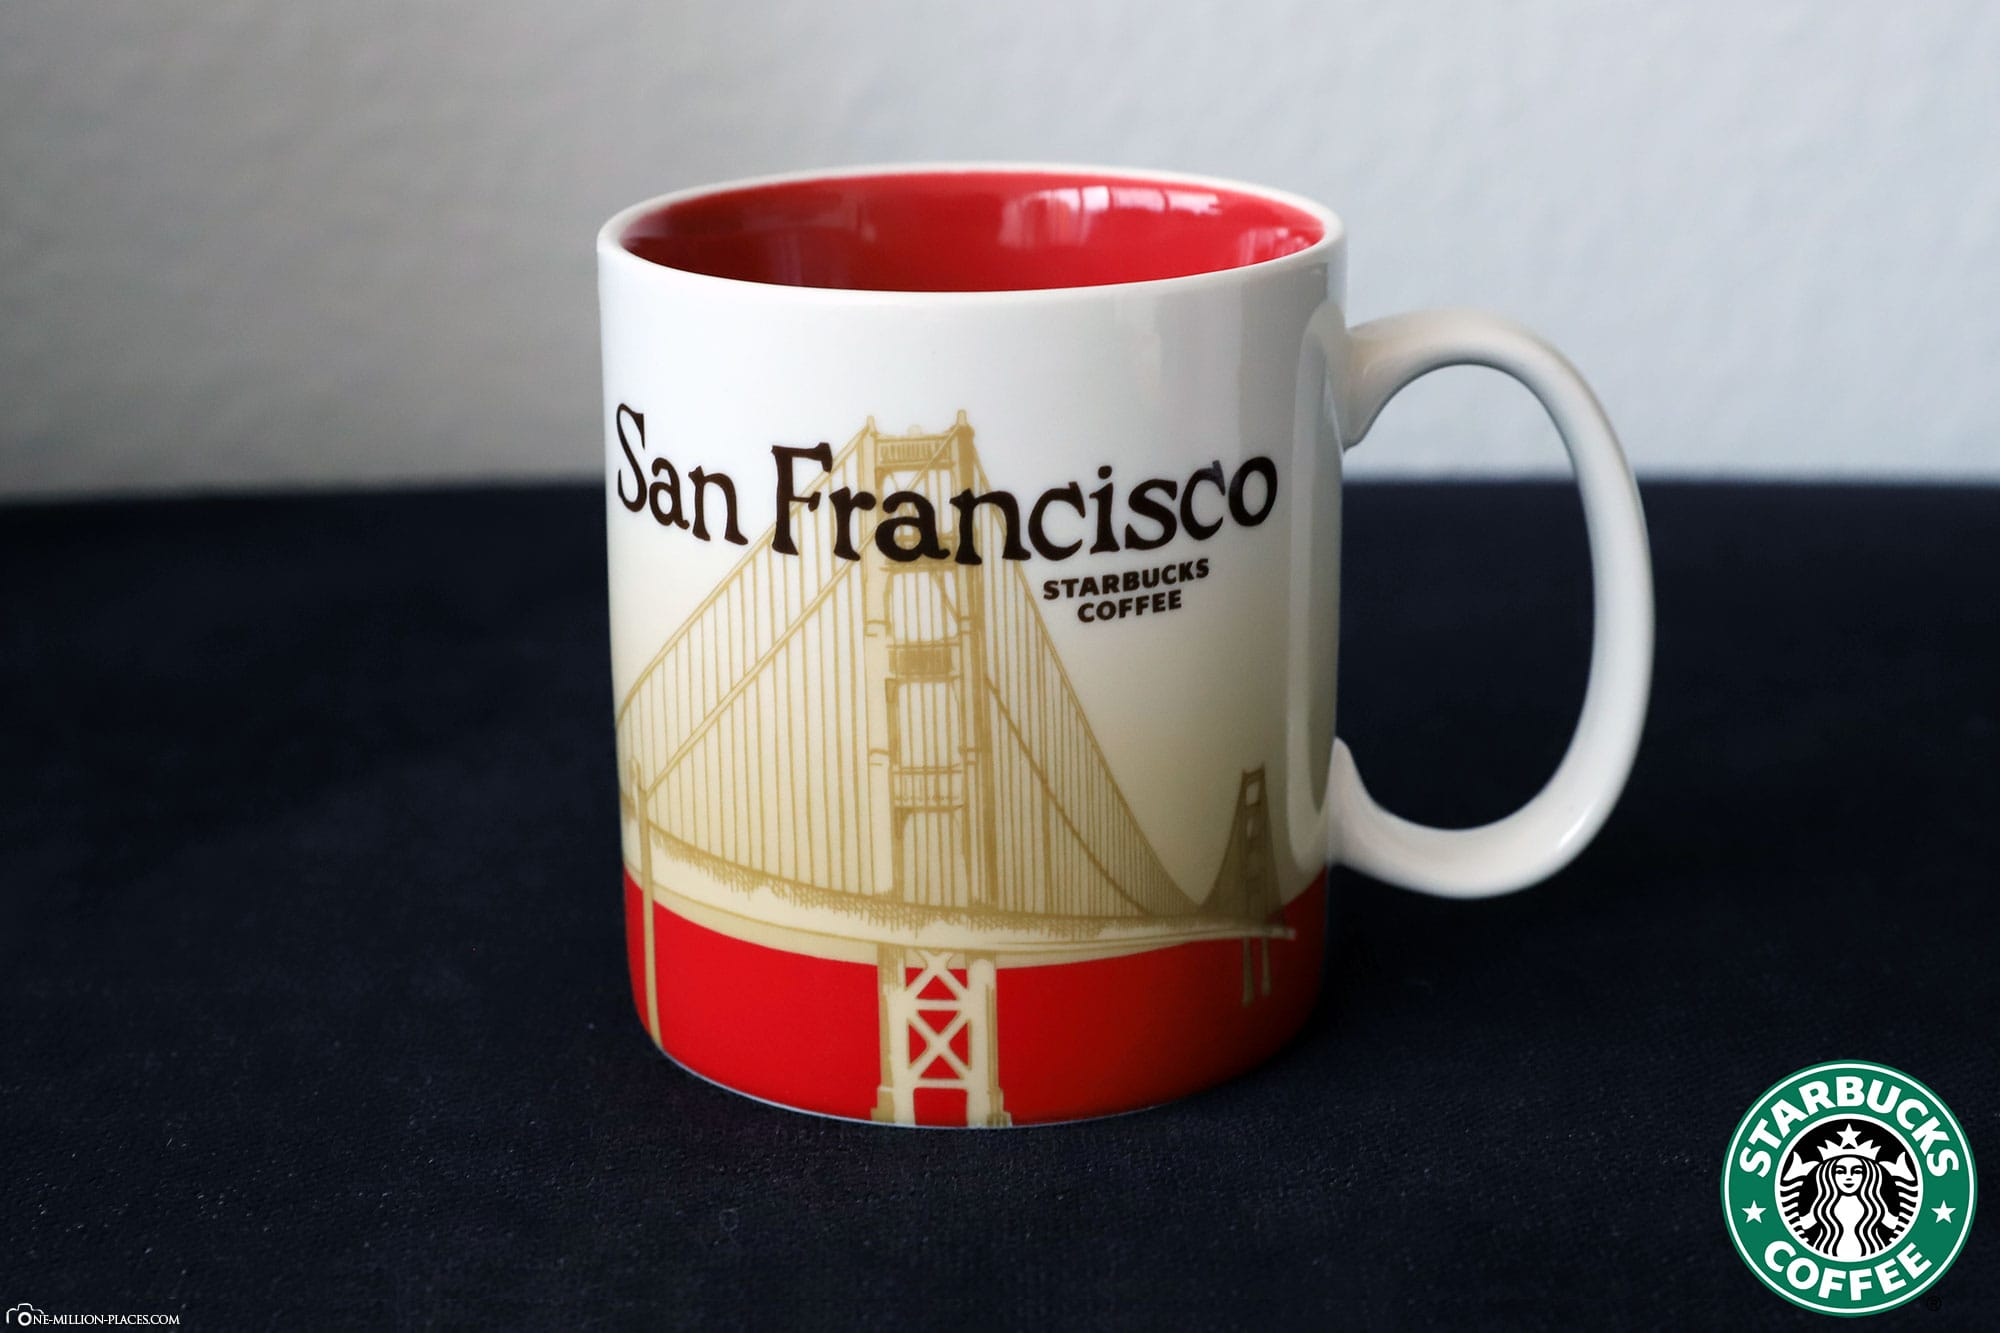 San Francisco, Starbucks Cup, Global Icon Series, City Mugs, Collection, USA, Travelreport